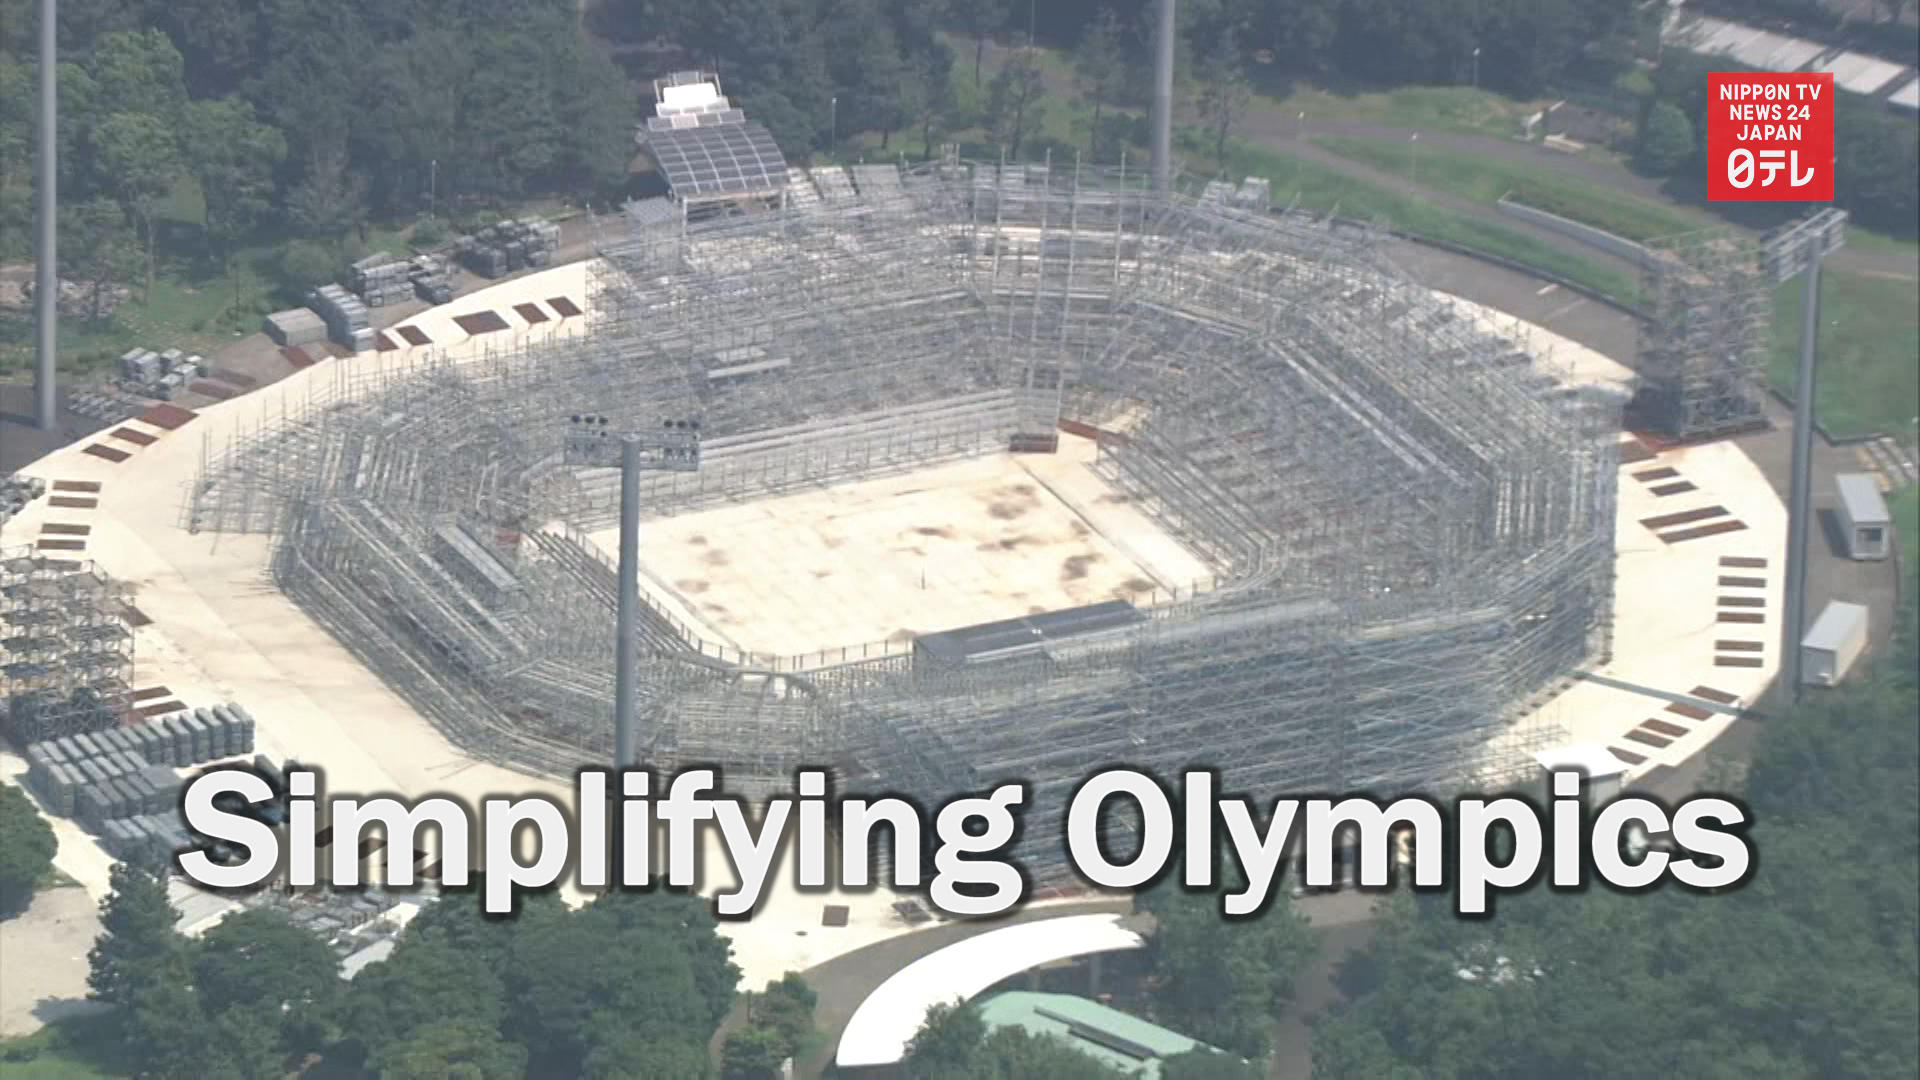 Simplifying Tokyo Games could save 30 billion yen